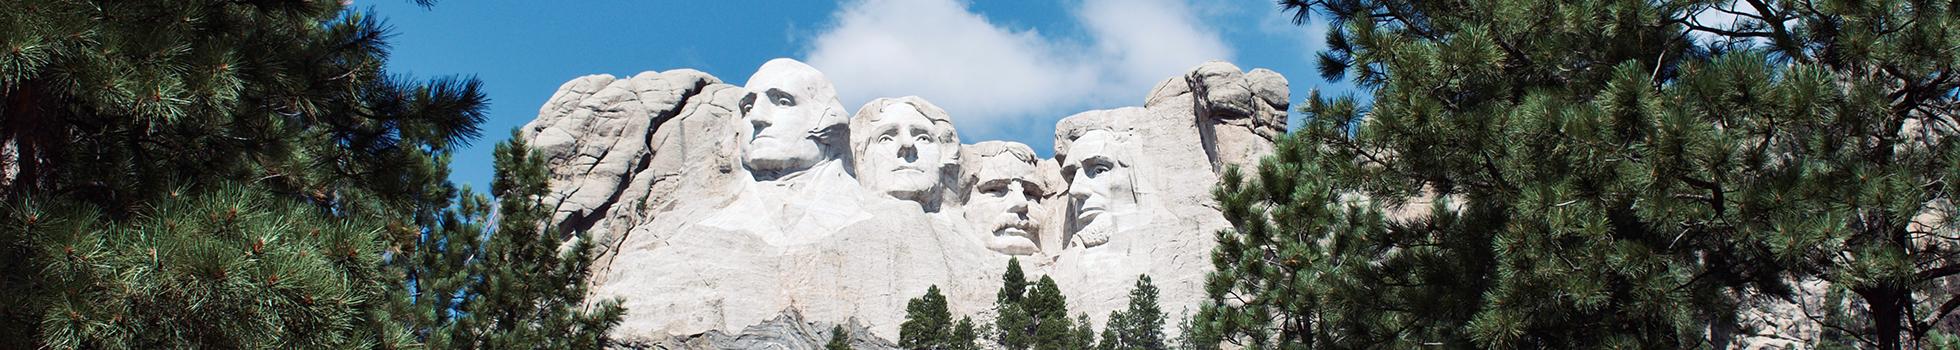 Exterior of Mount Rushmore.